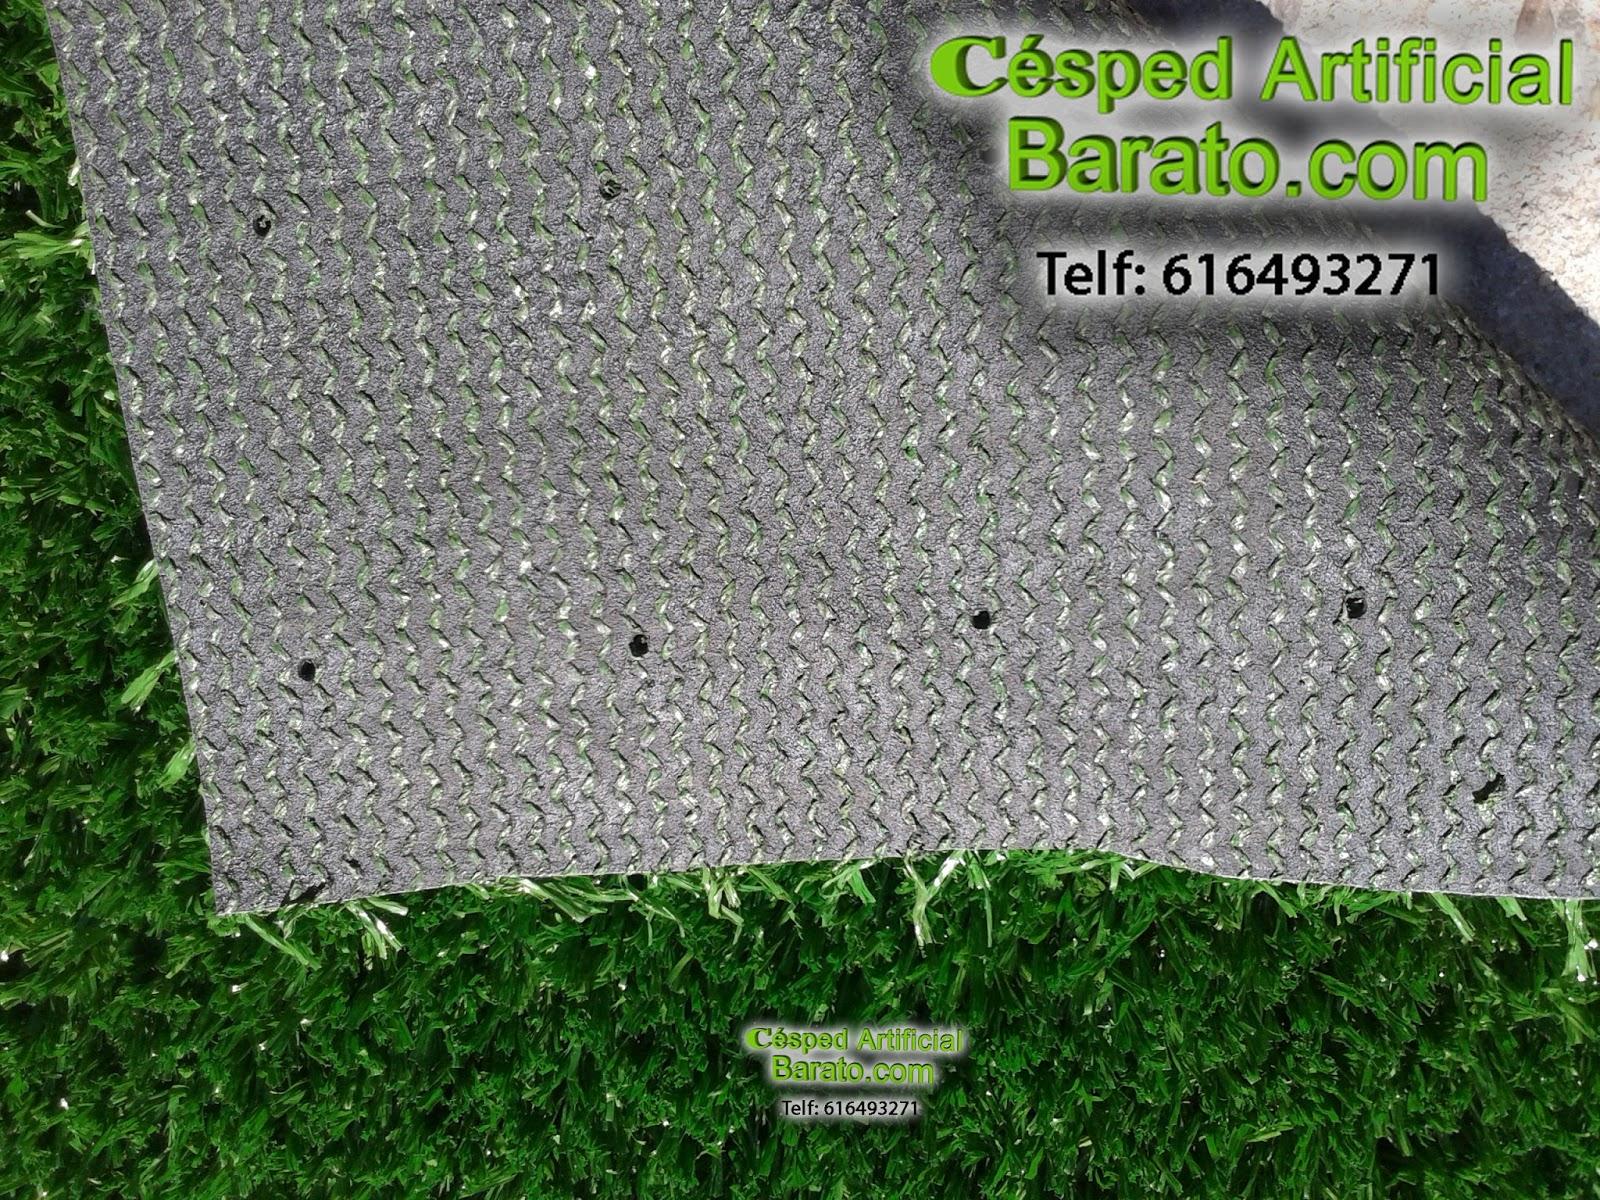 Ofertas c sped artificial barato abril 2013 - Cesped artificial precio ...